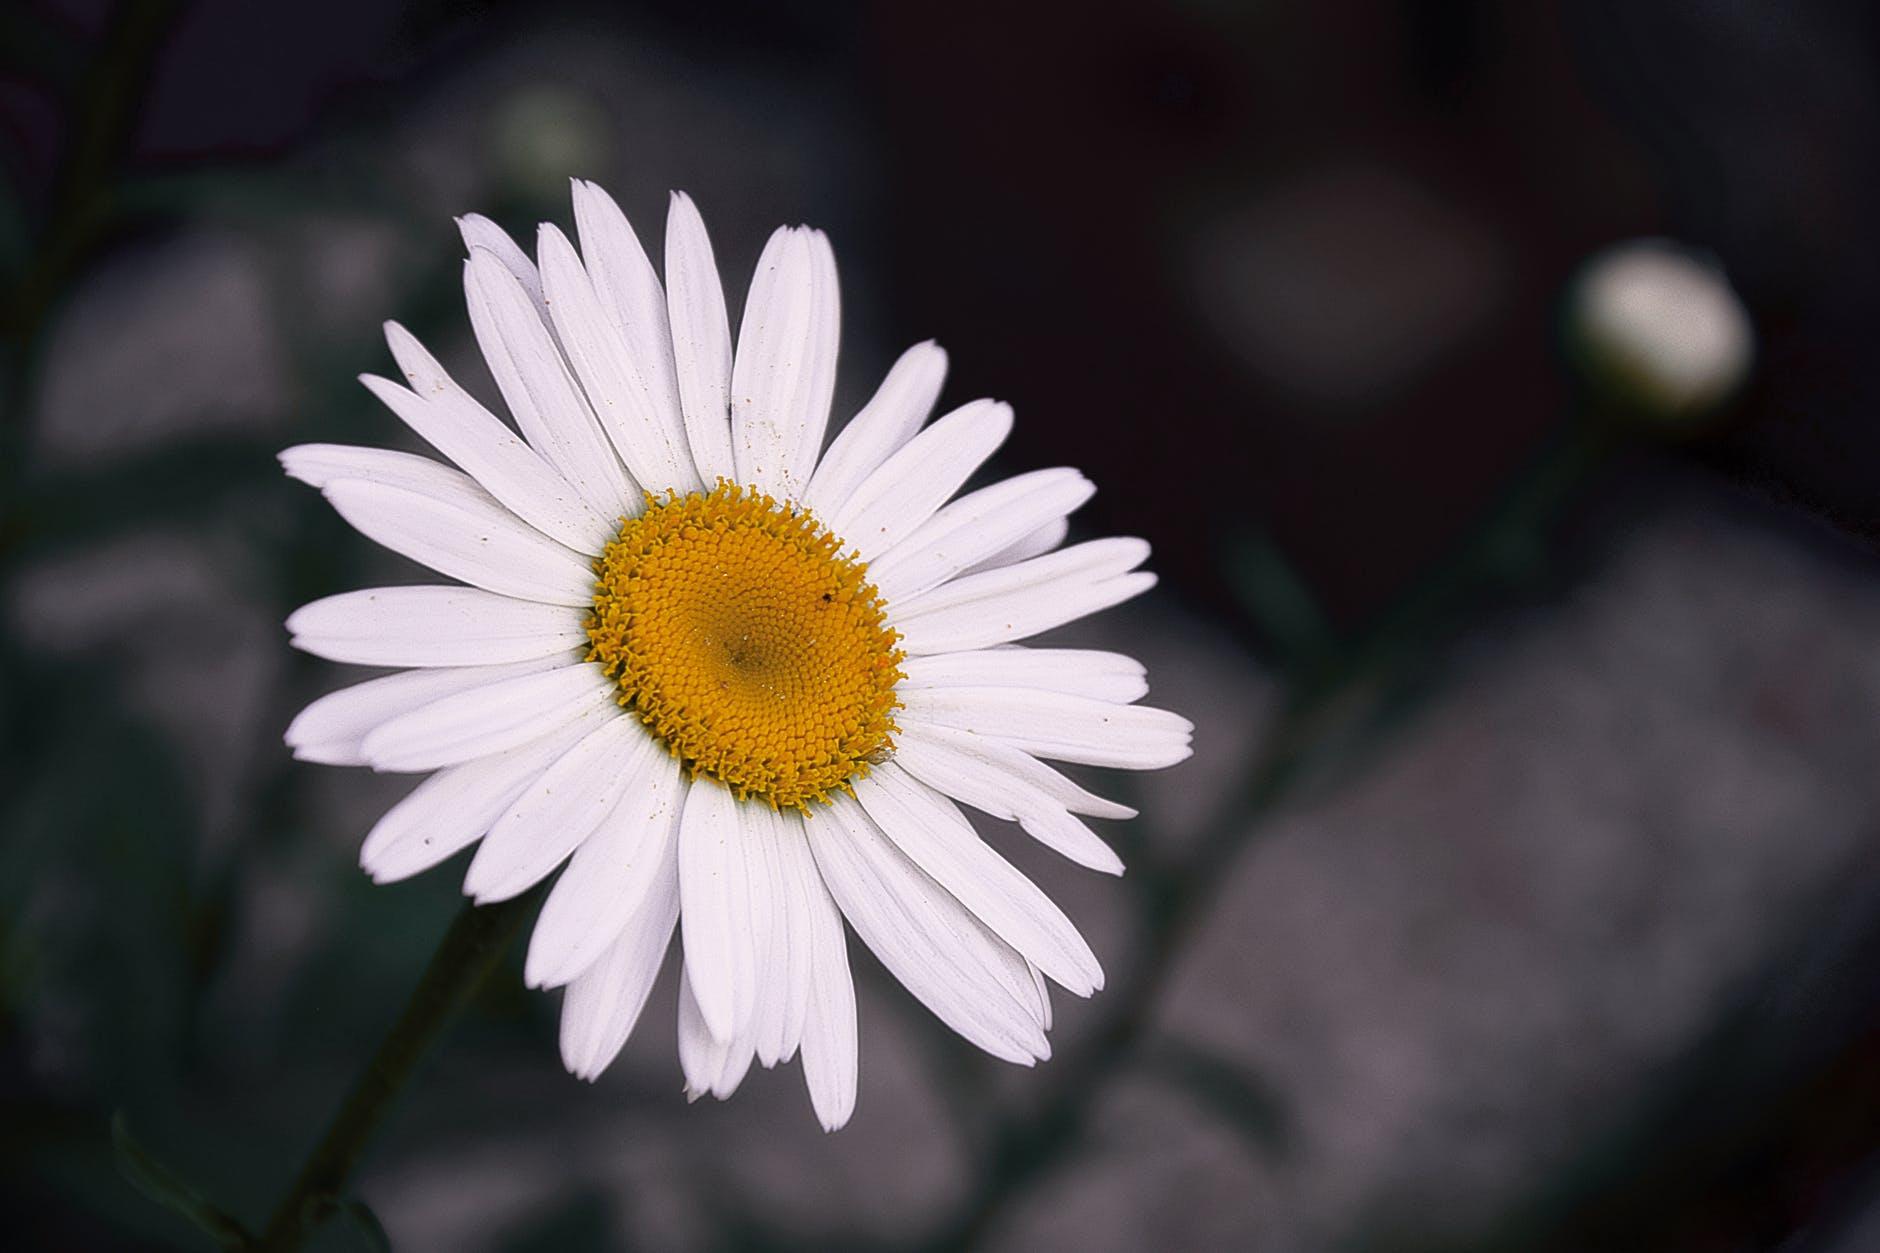 nature petals flower outdoors